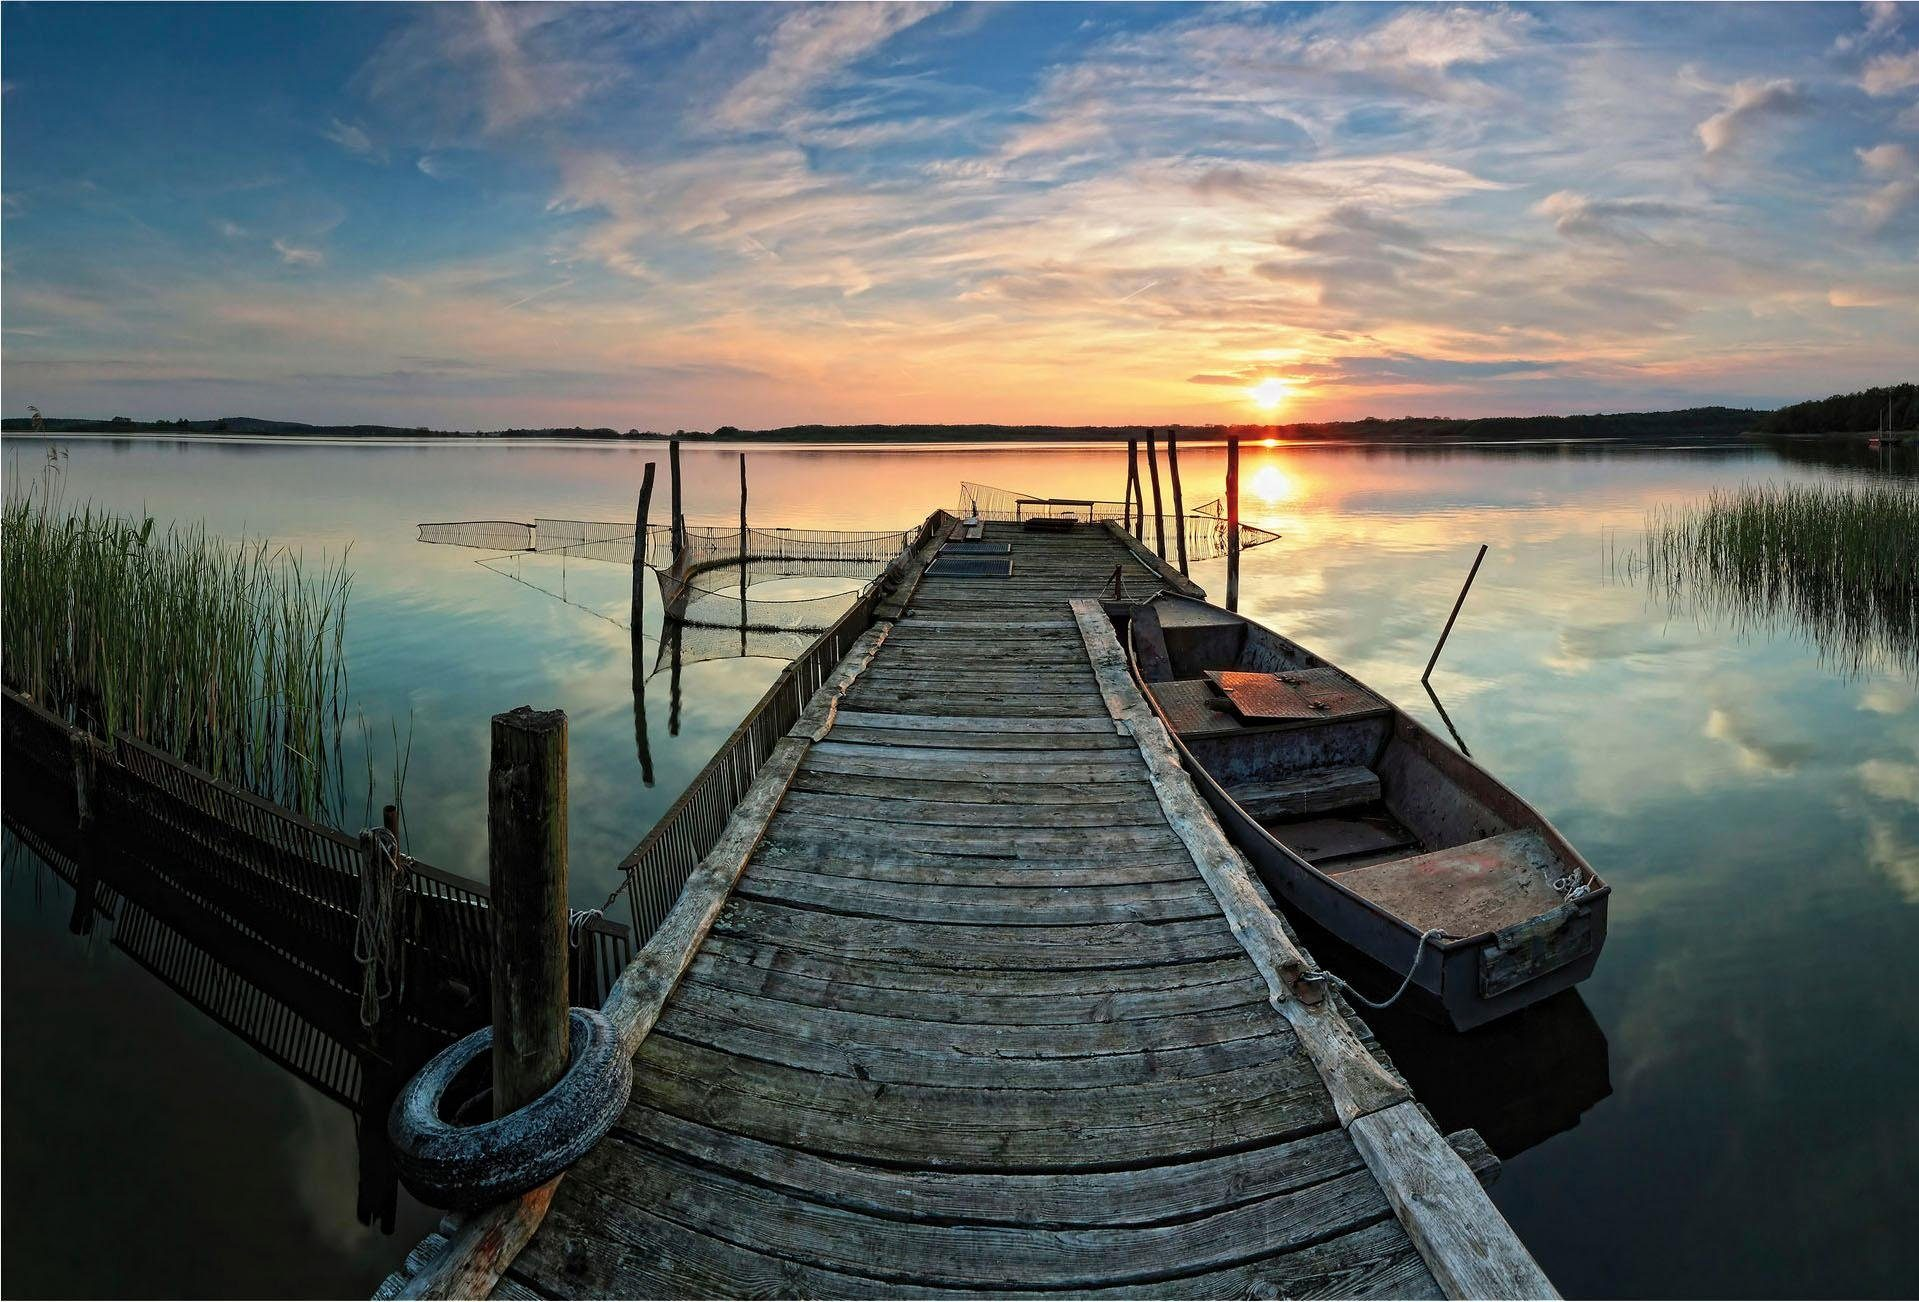 Fototapete »Sunset at the lake« 384/260 cm